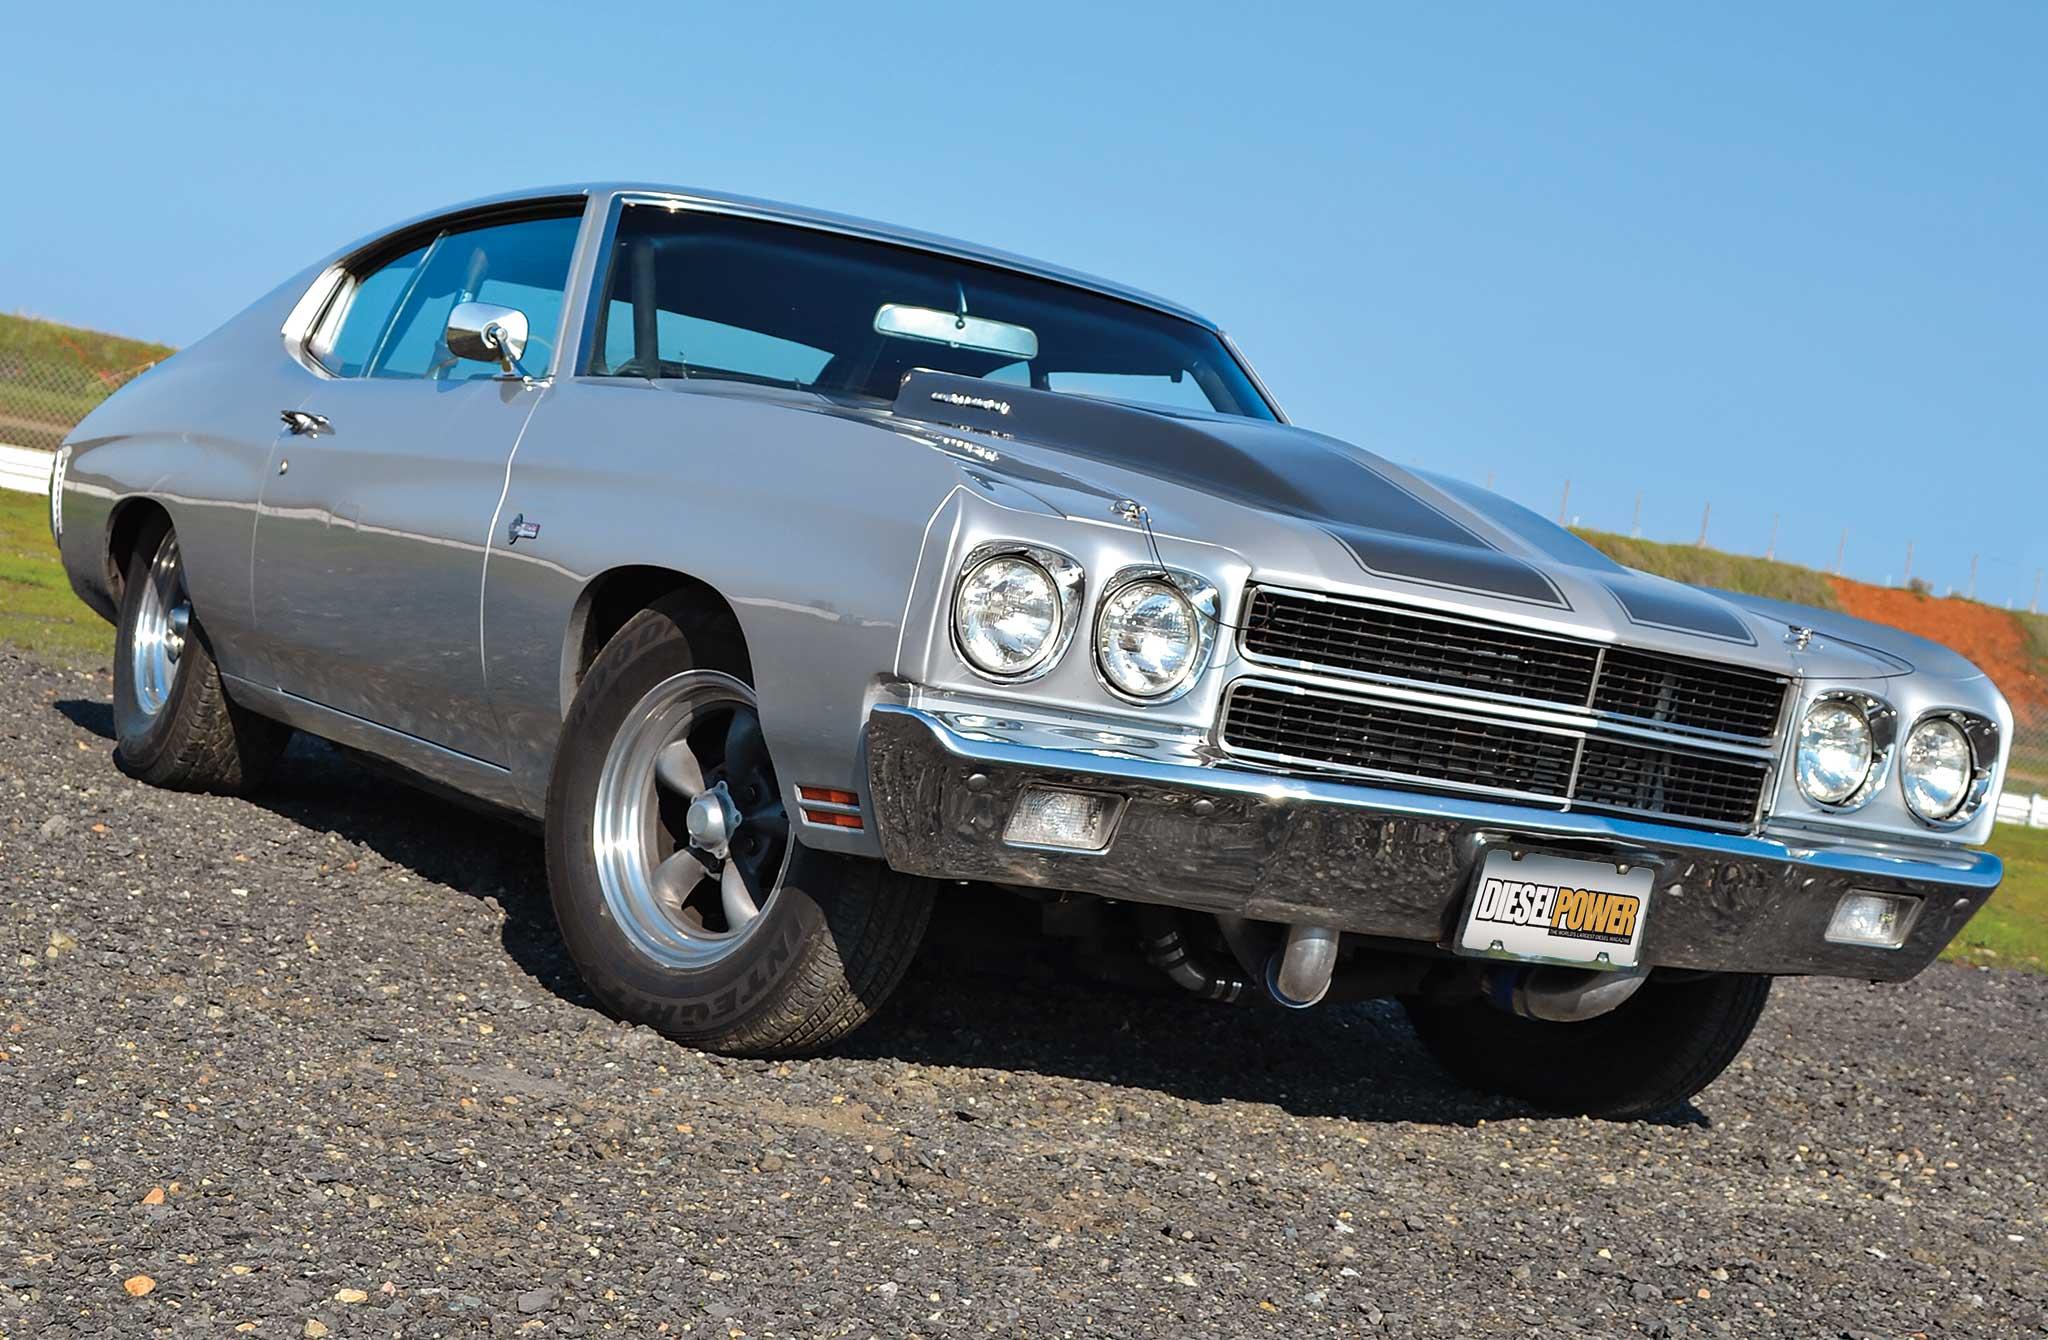 1970 Chevrolet Chevelle - Dream Machine